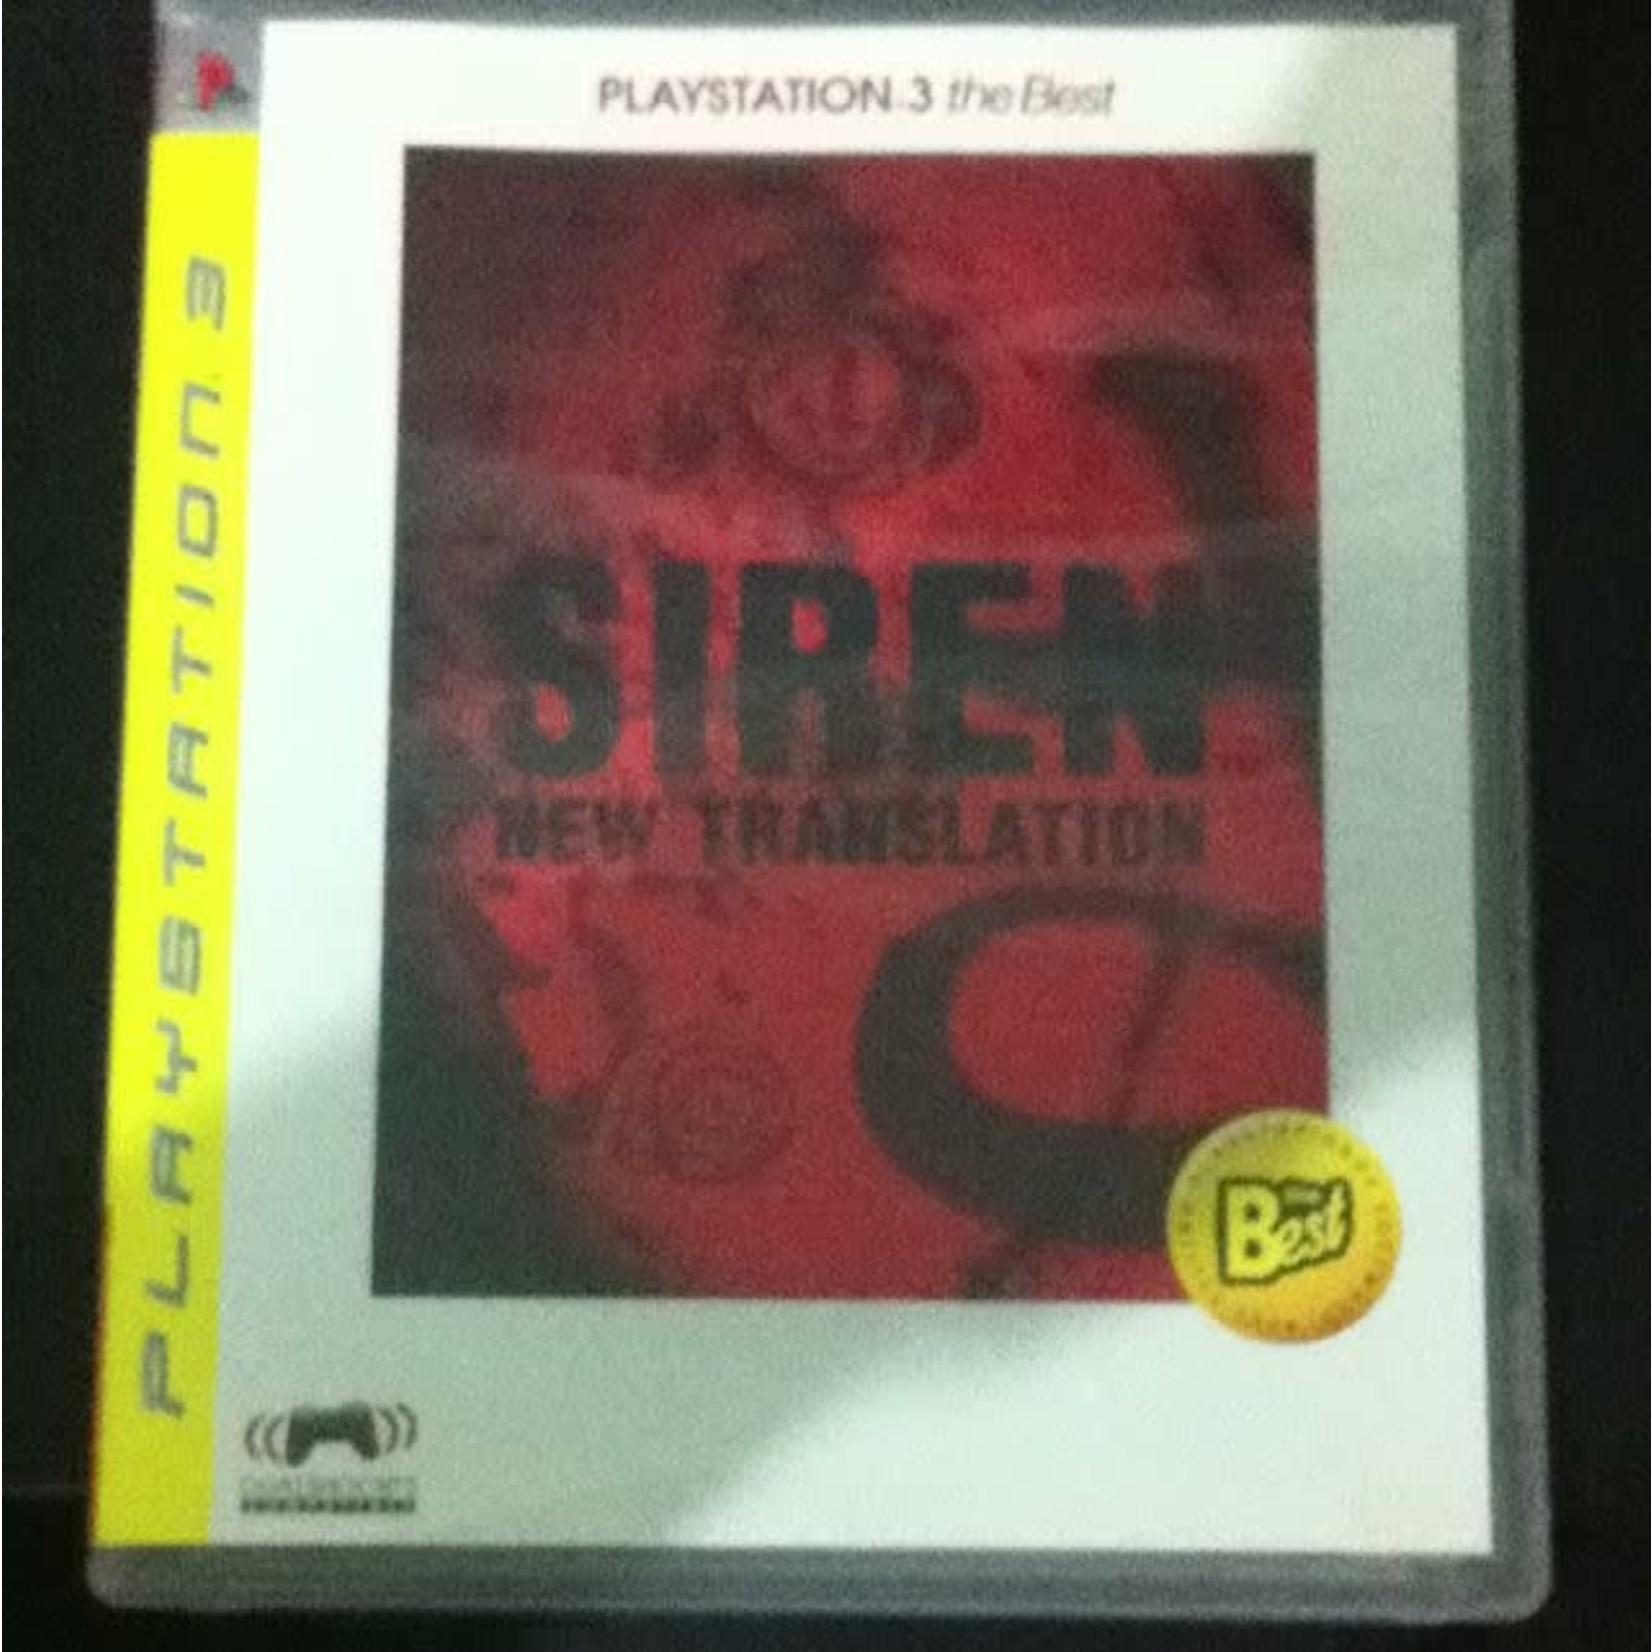 IMPORT-PS3U-SIREN: New Translation  (COMPLETE MINT)